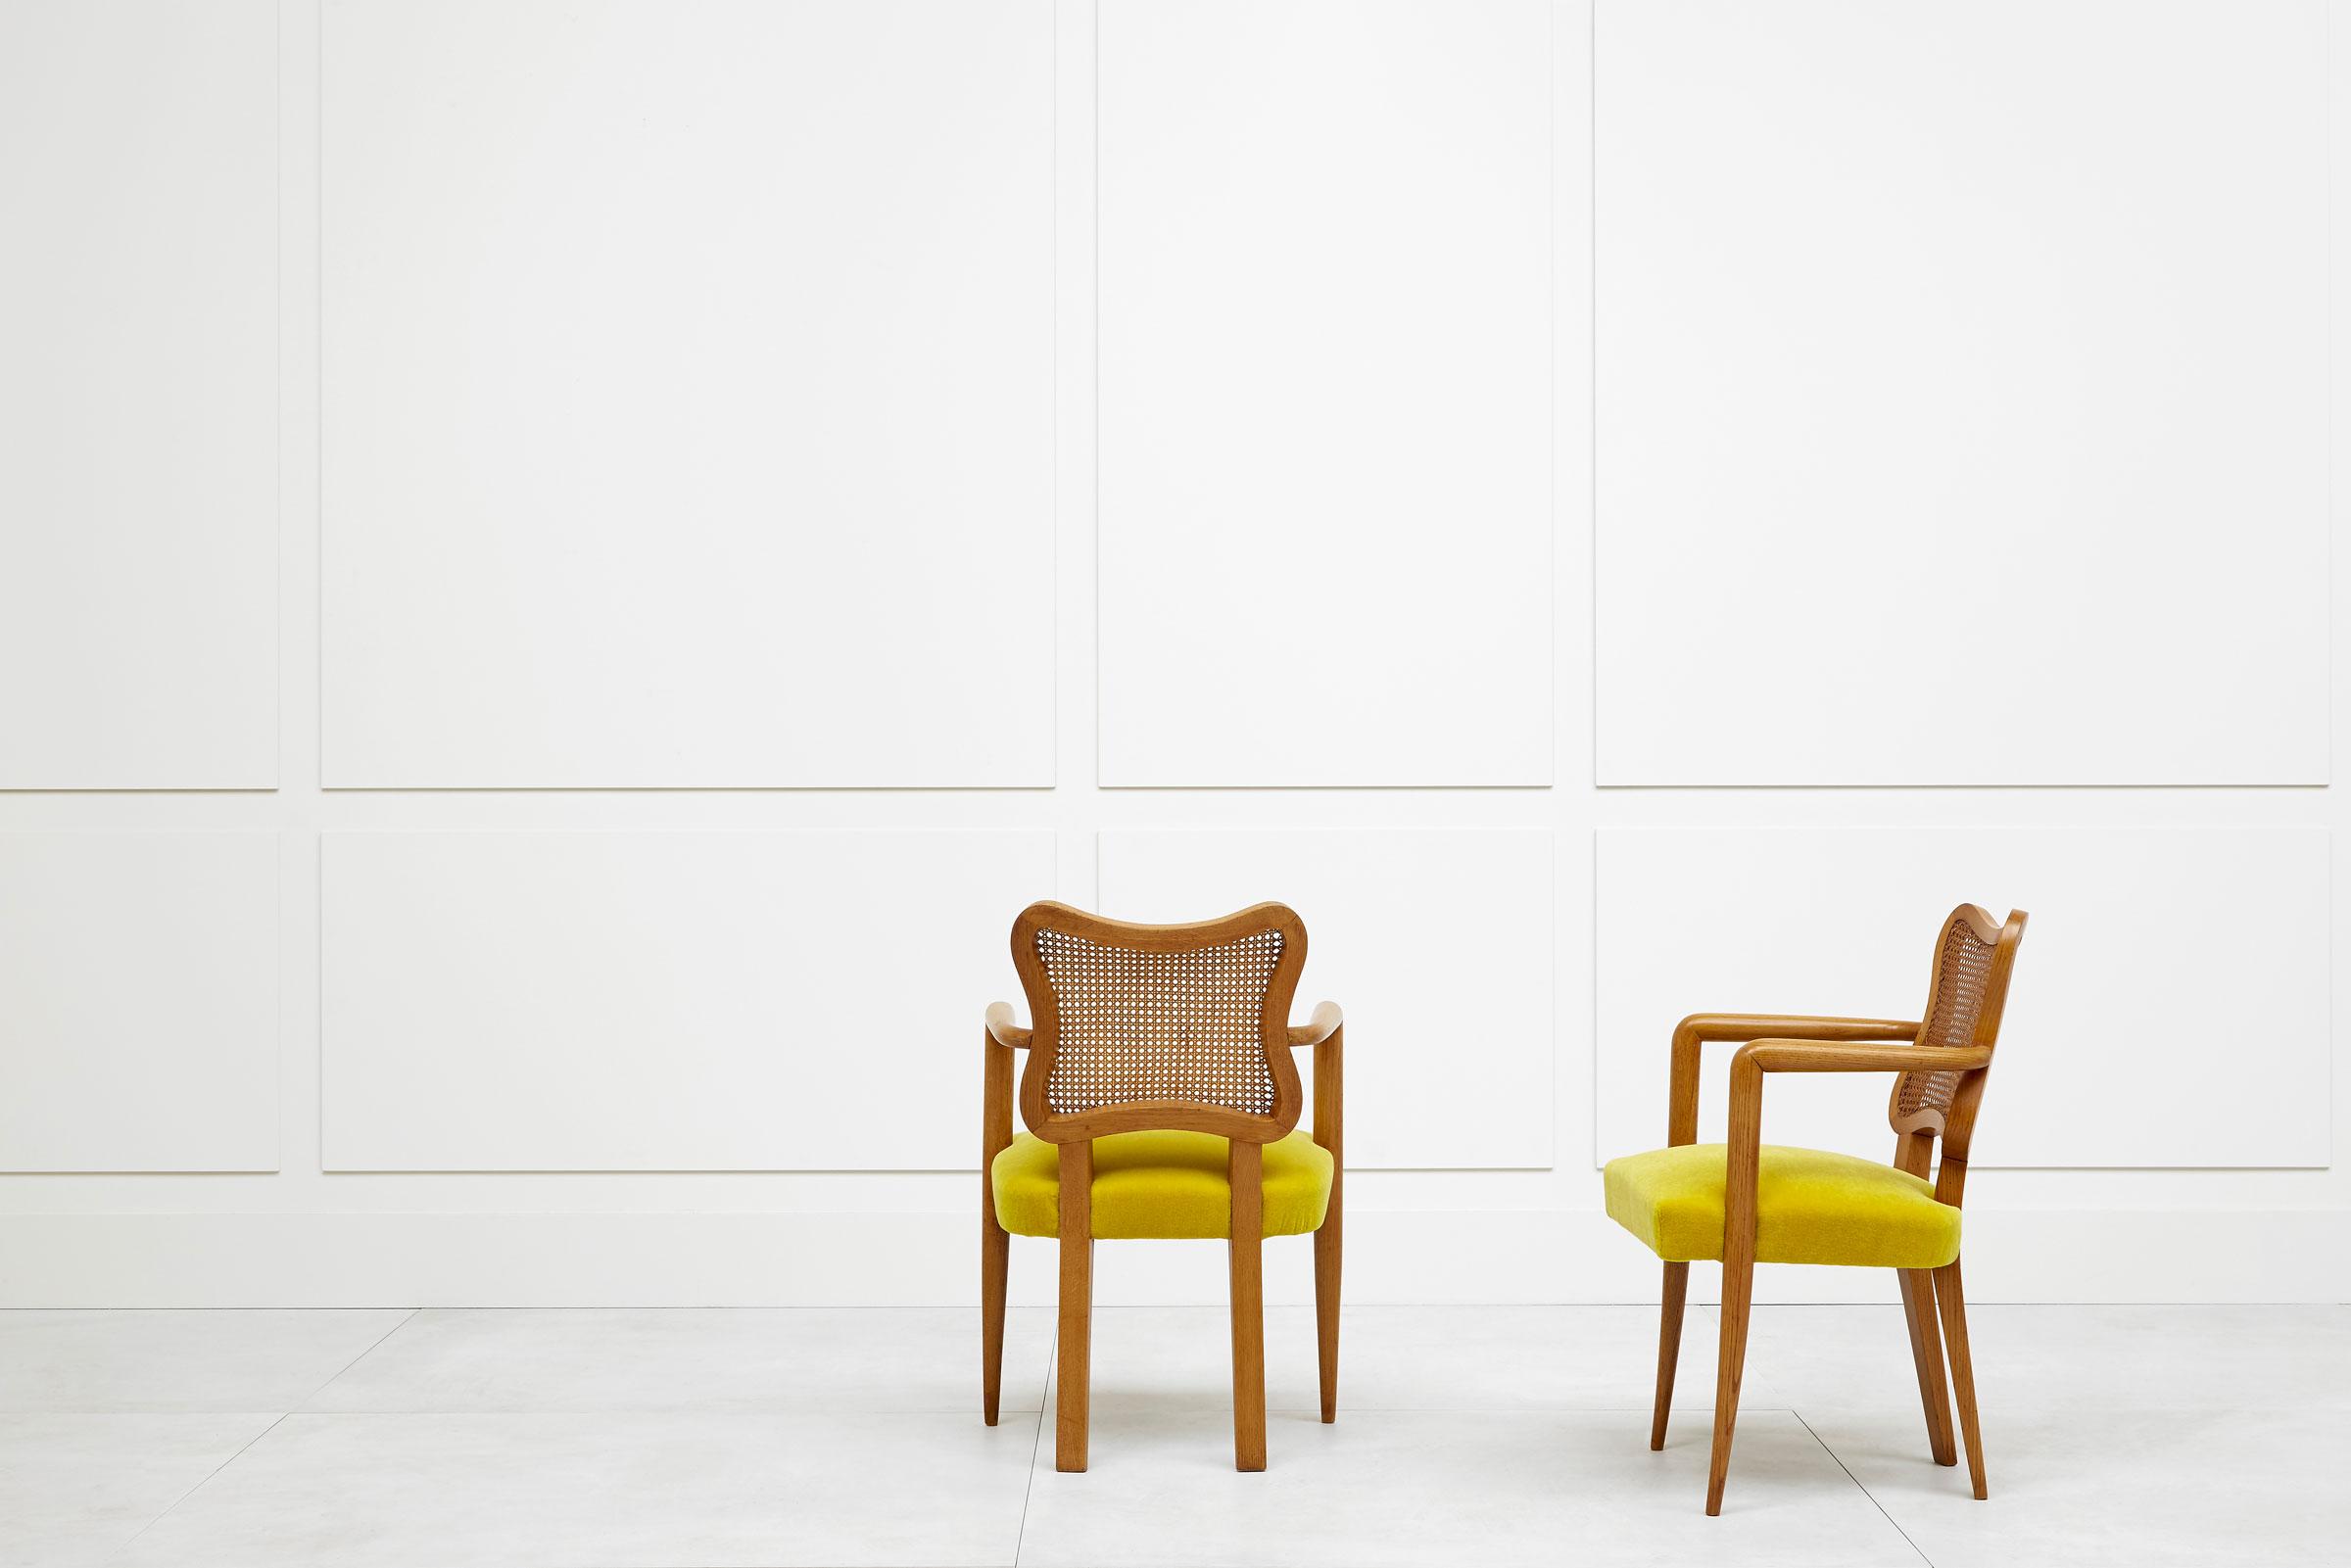 Jean Royère, Pair of «Trèfle» armchairs, vue 02